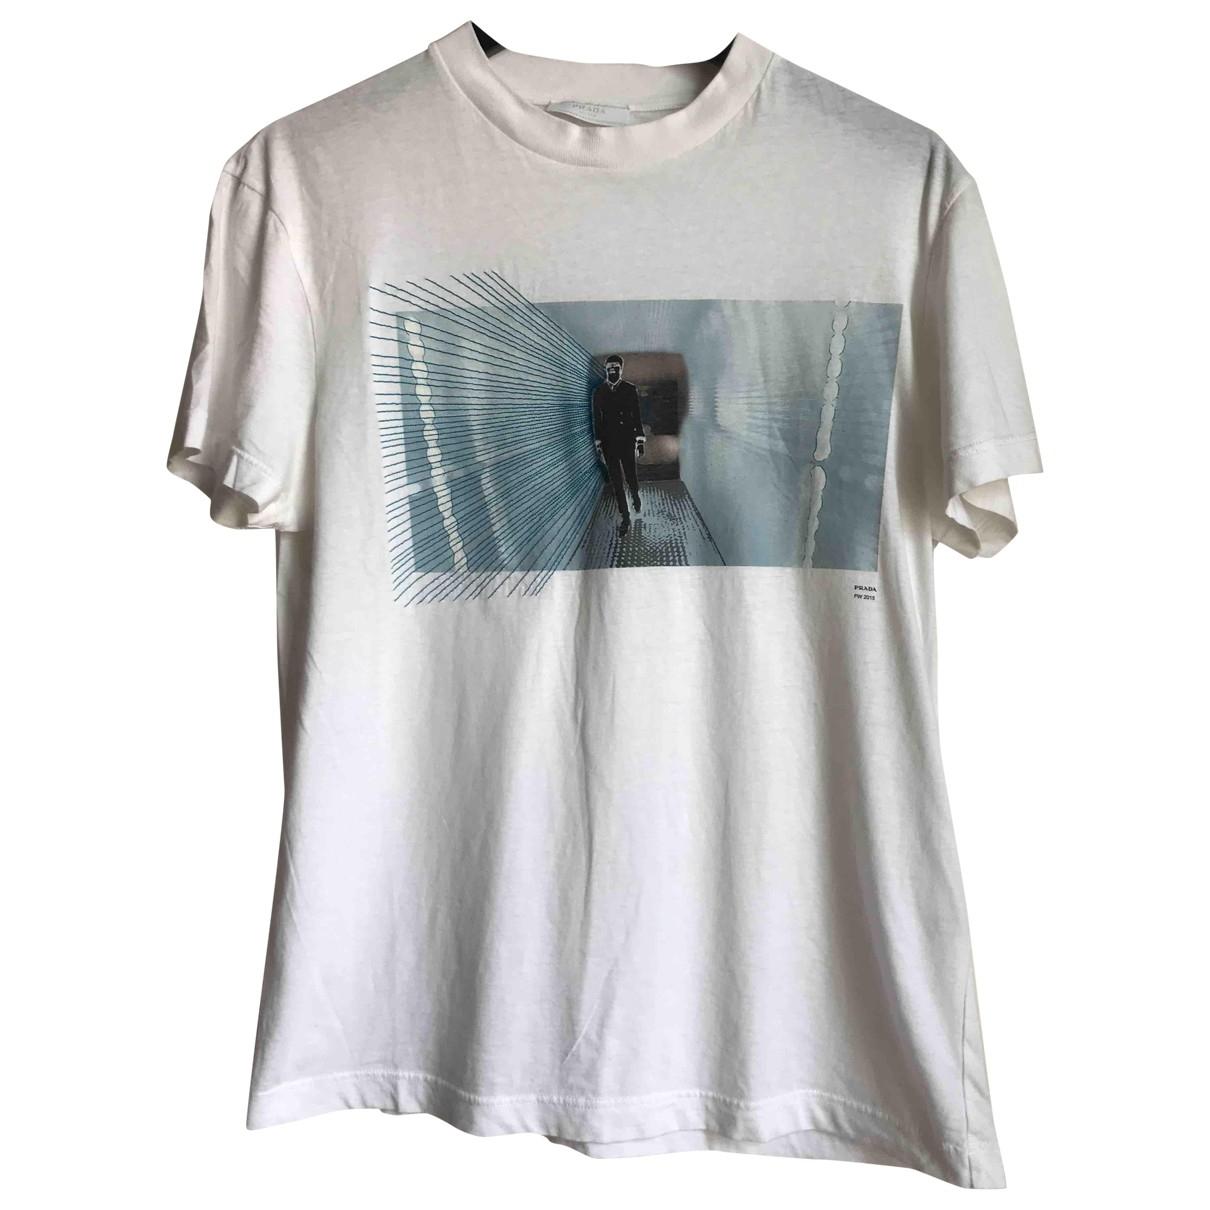 Prada \N T-Shirts in  Weiss Baumwolle